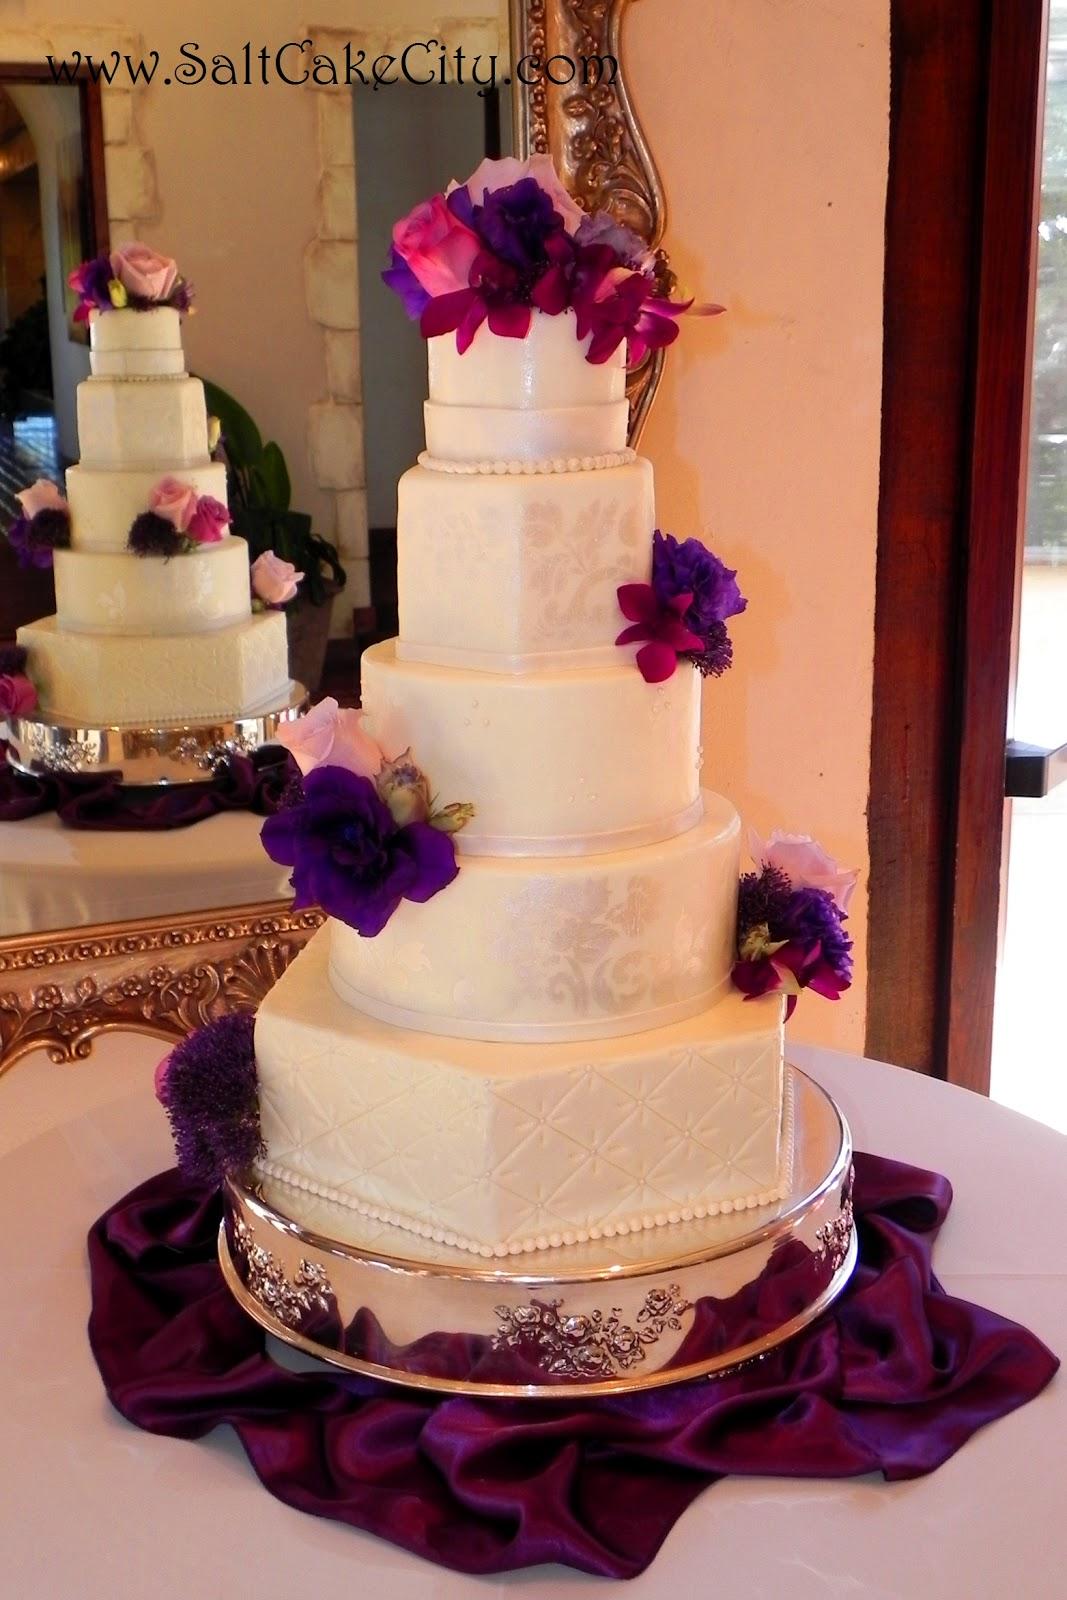 Images Of Round Wedding Cake : Salt Cake City: Round & Hexagon Wedding Cake